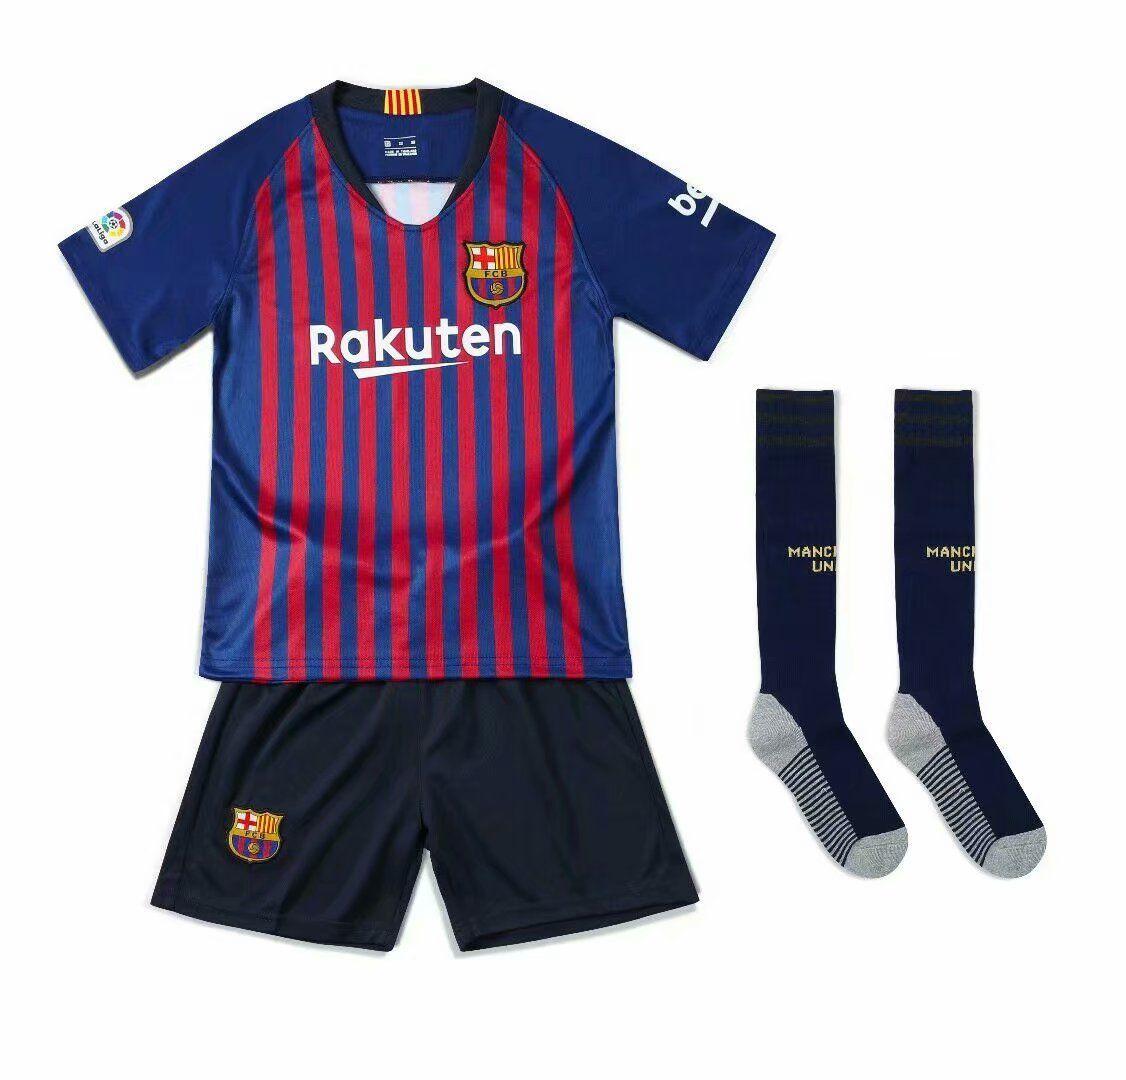 2018 19 Kids Barcelona Home Without Brand Logo Soccer Kits Children Football Uniform Football Uniforms Soccer Kits Soccer Uniforms